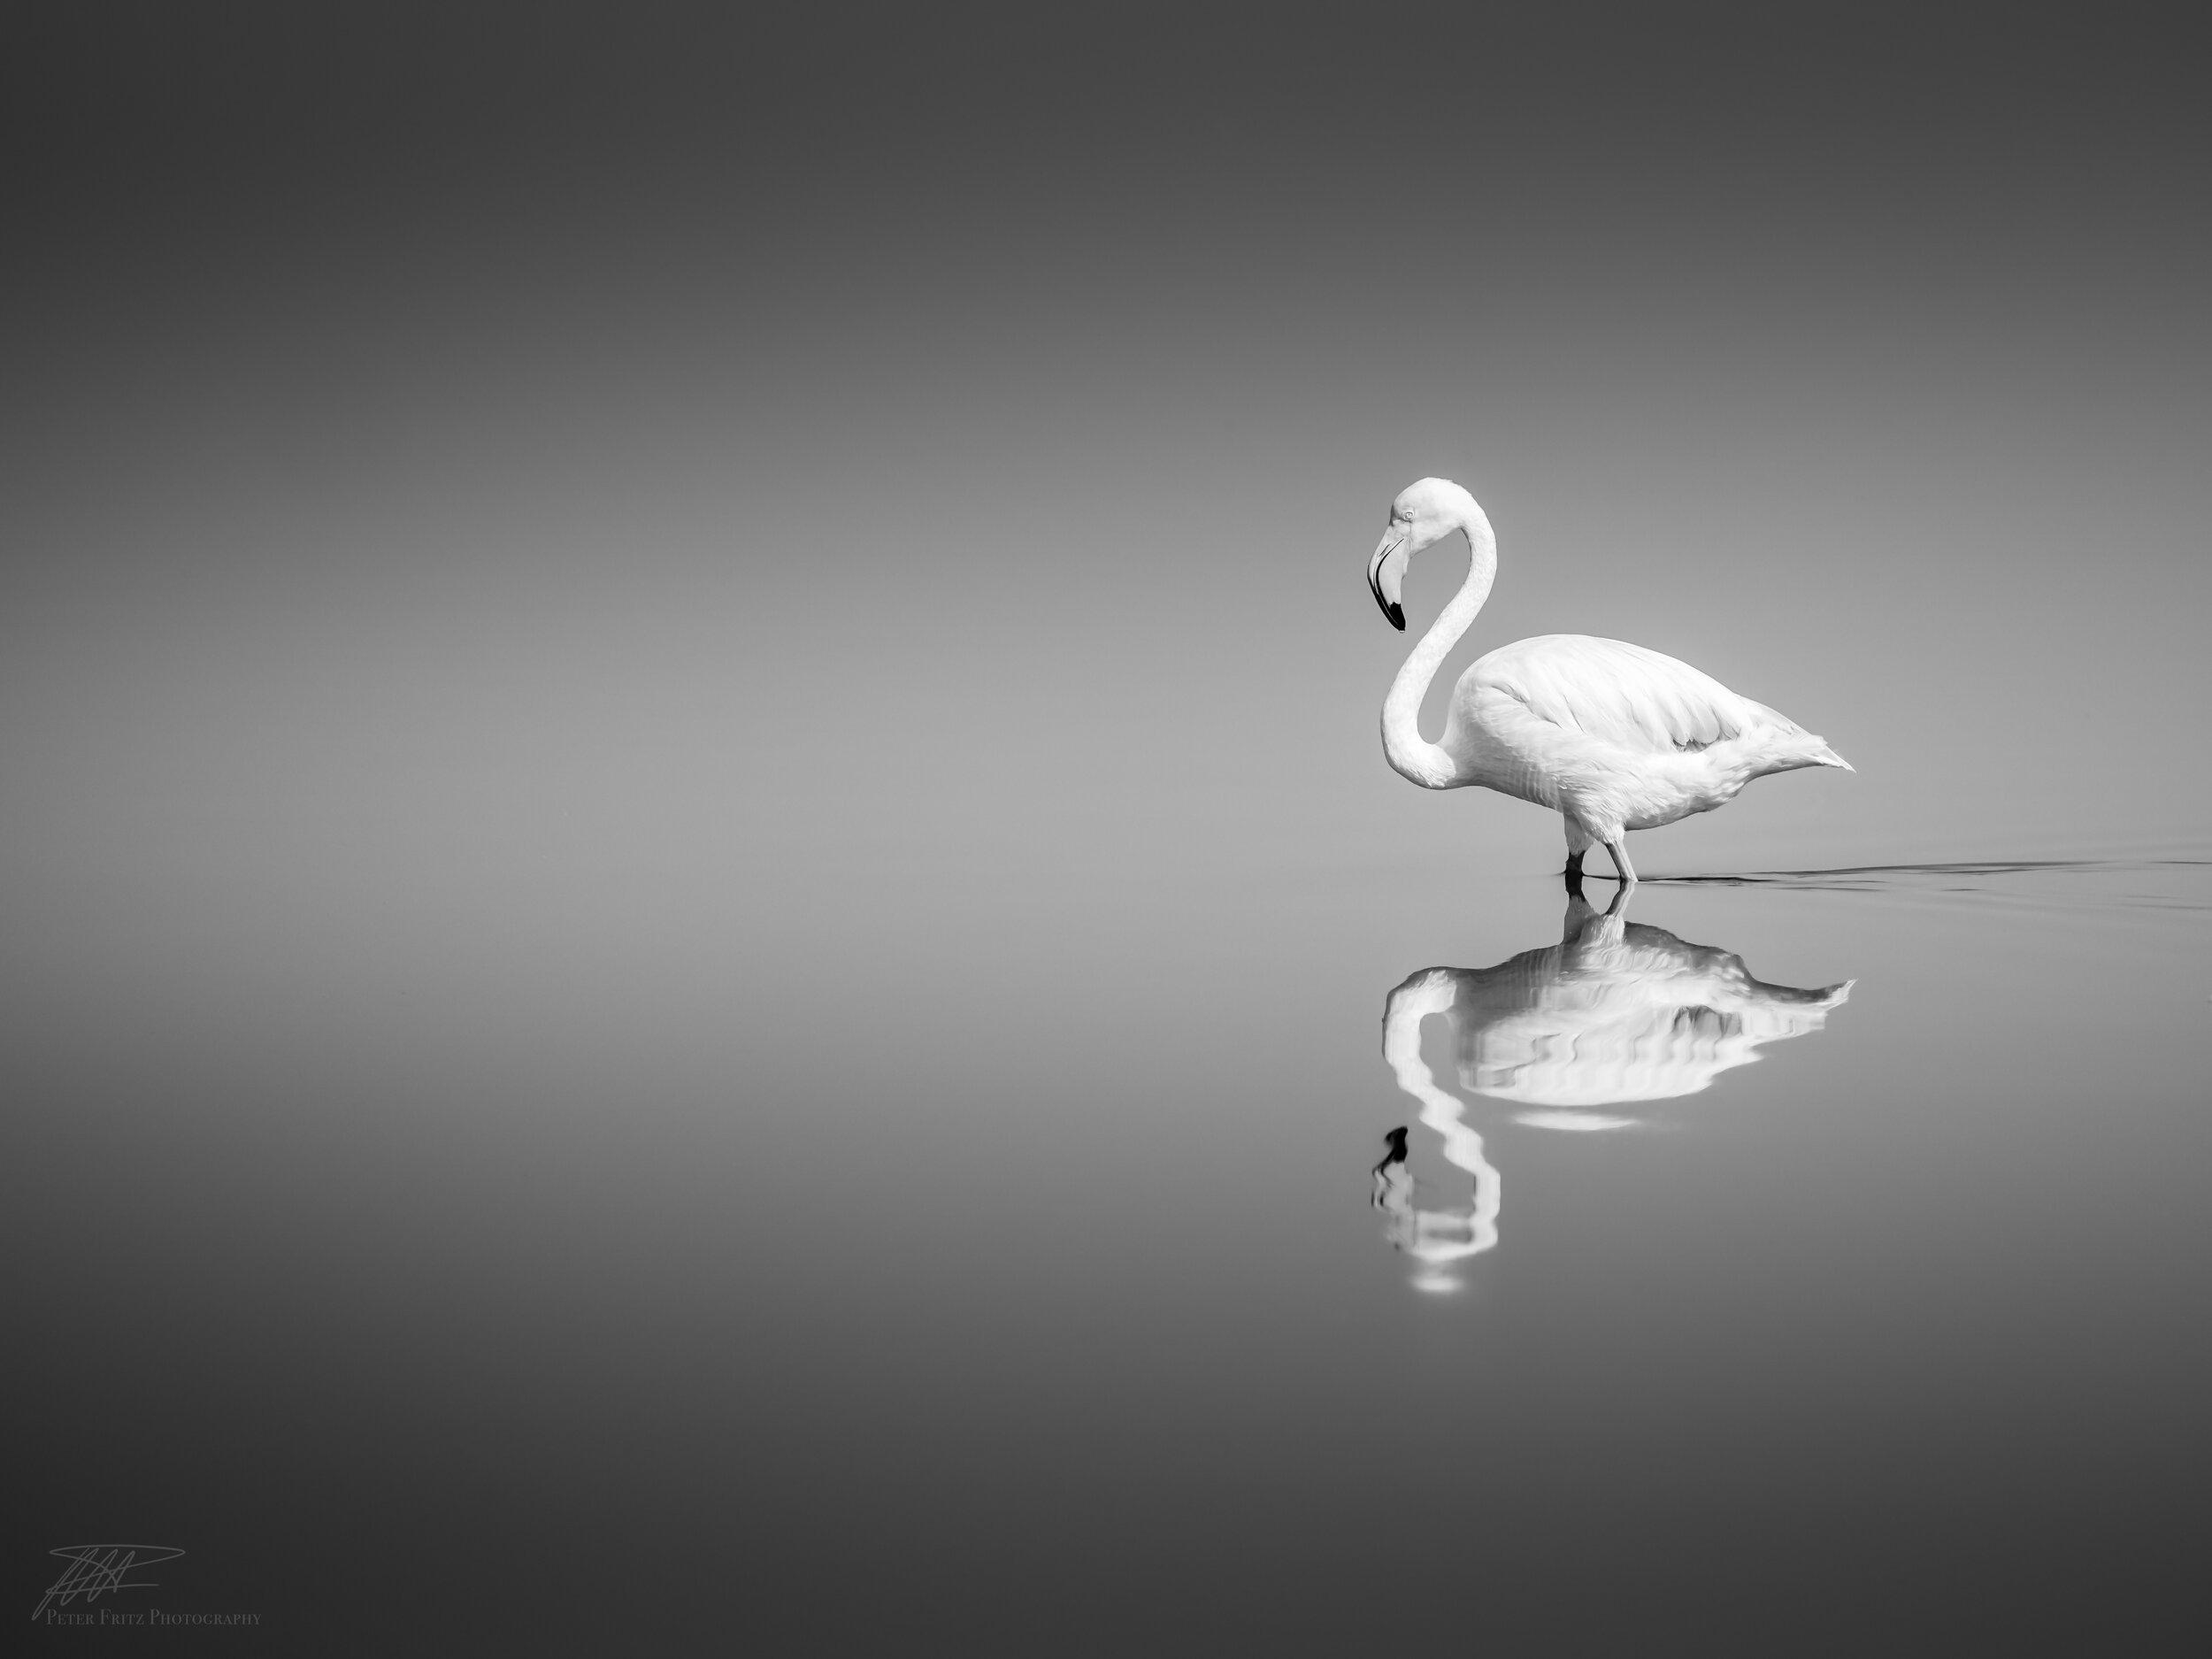 Flamingo BNW_.jpg